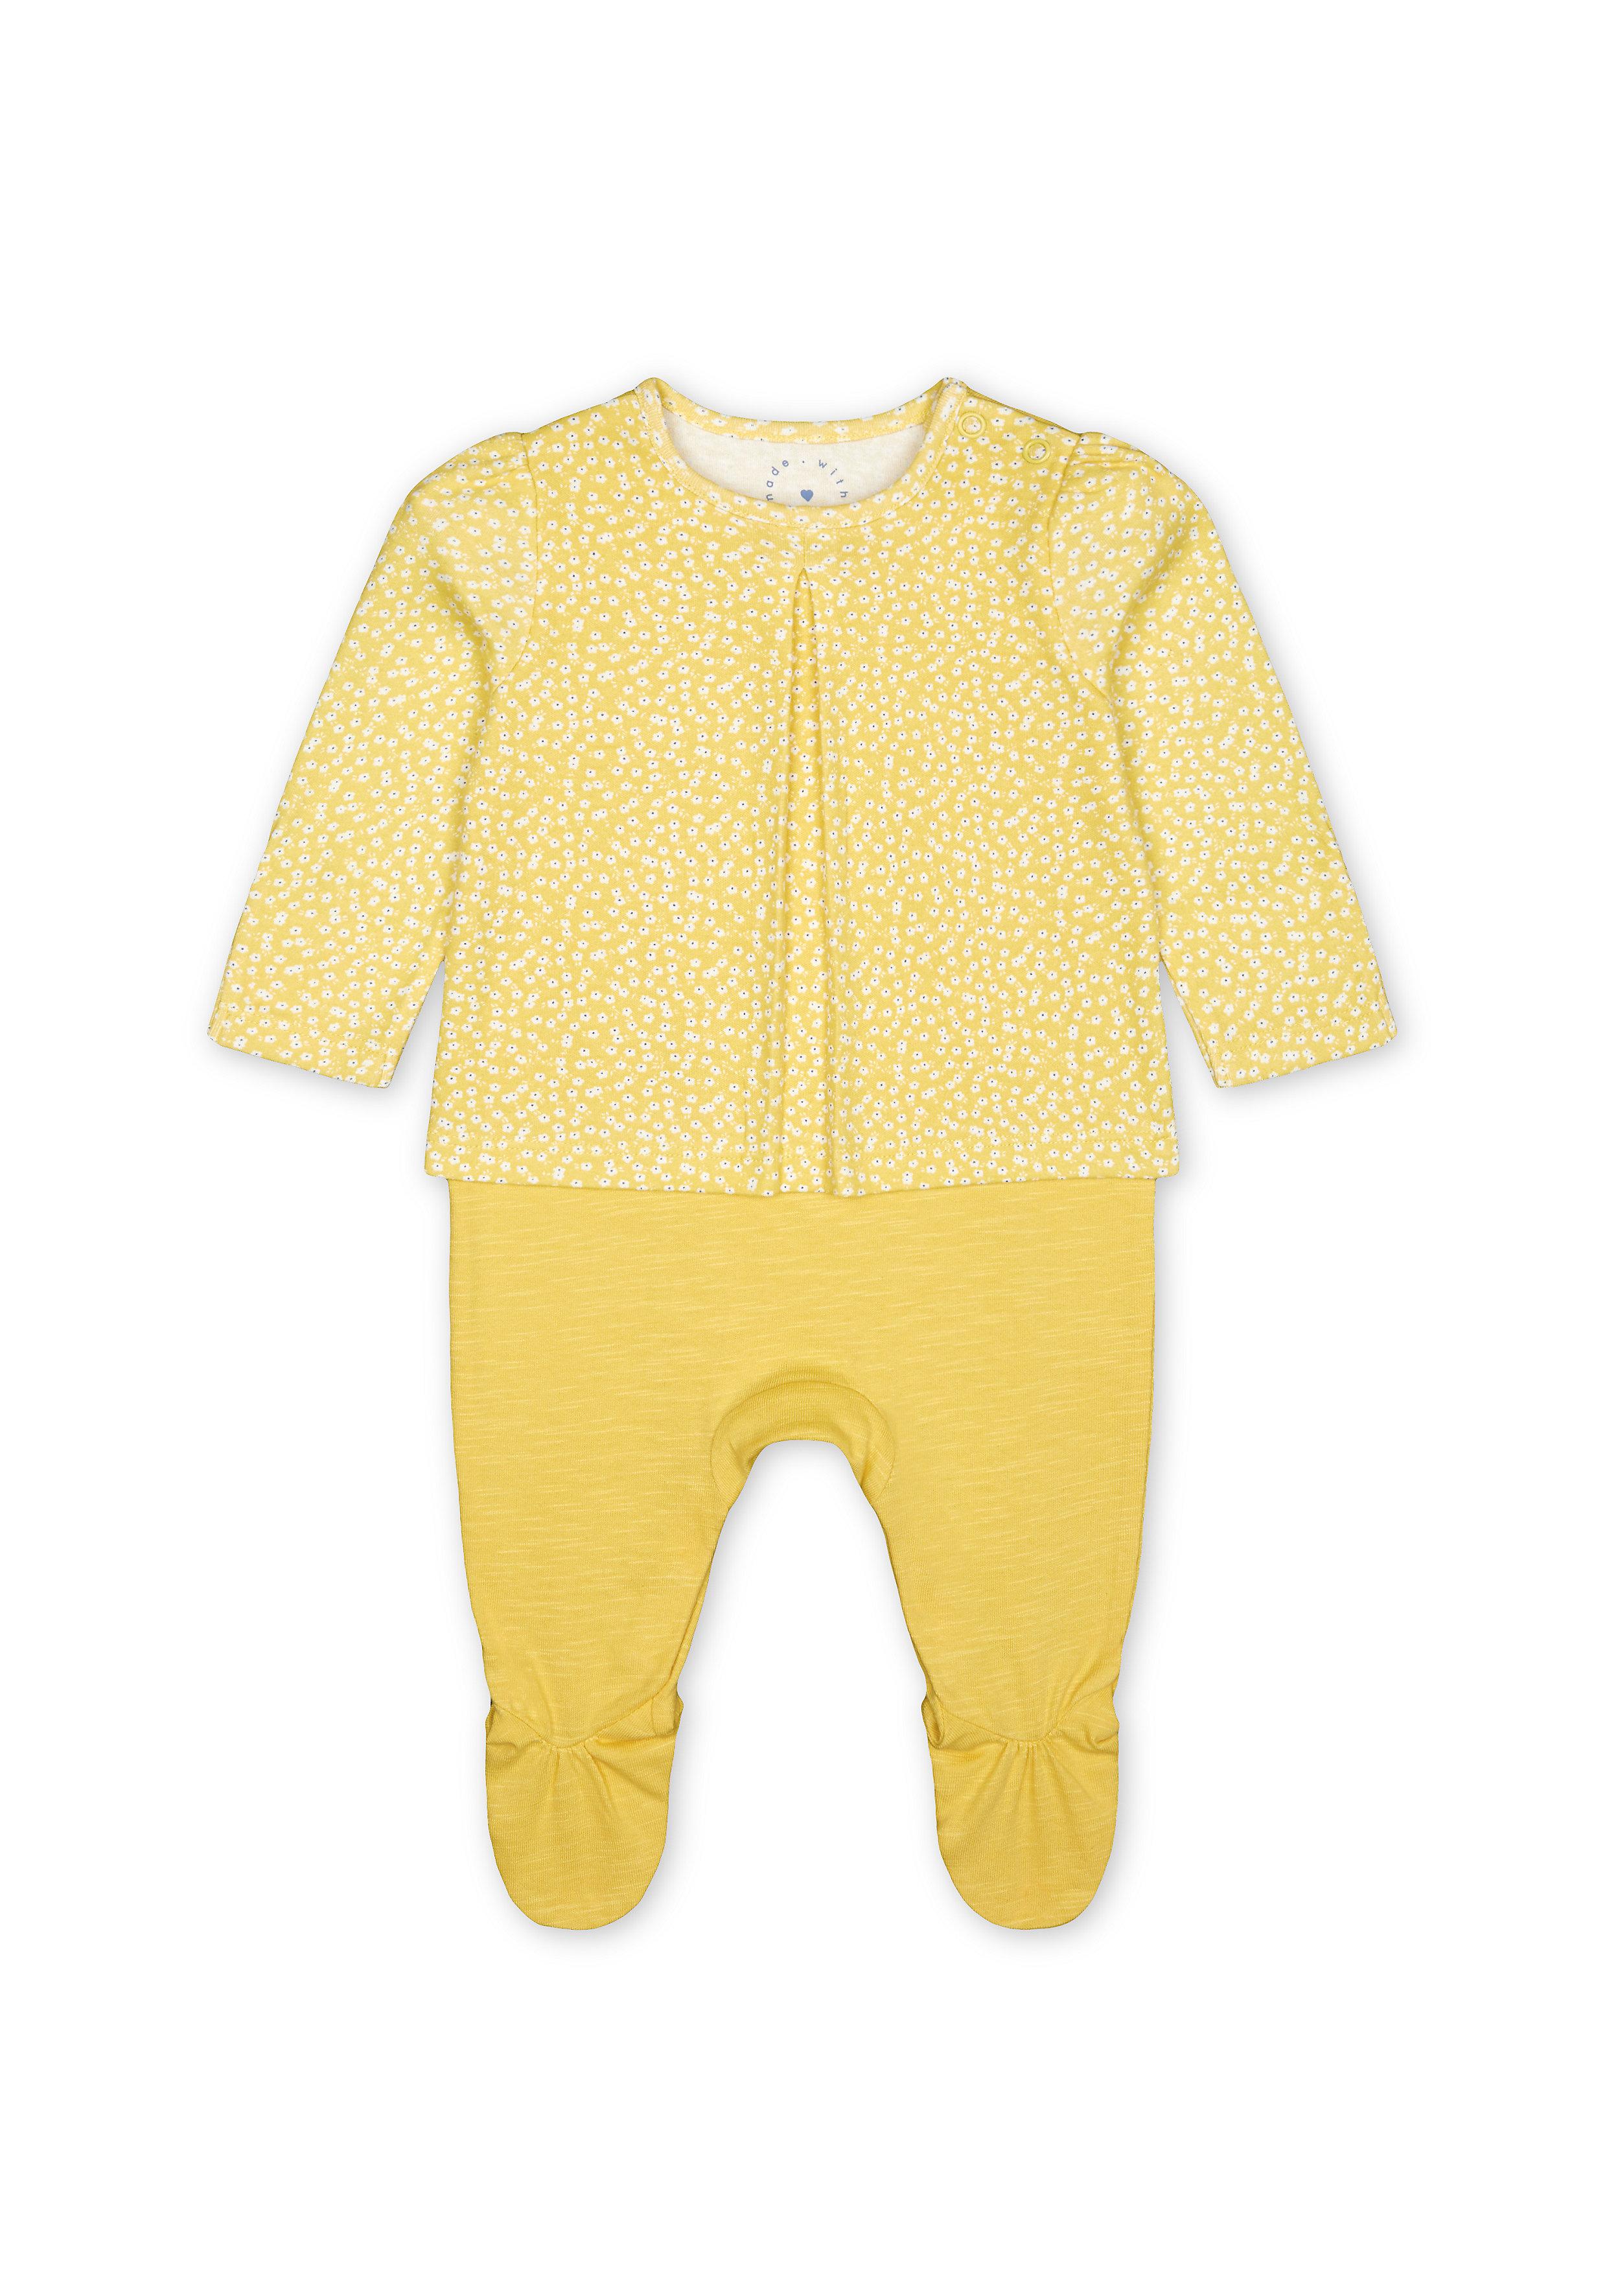 Mothercare   Girls Full Sleeves Romper Daisy Print - Yellow